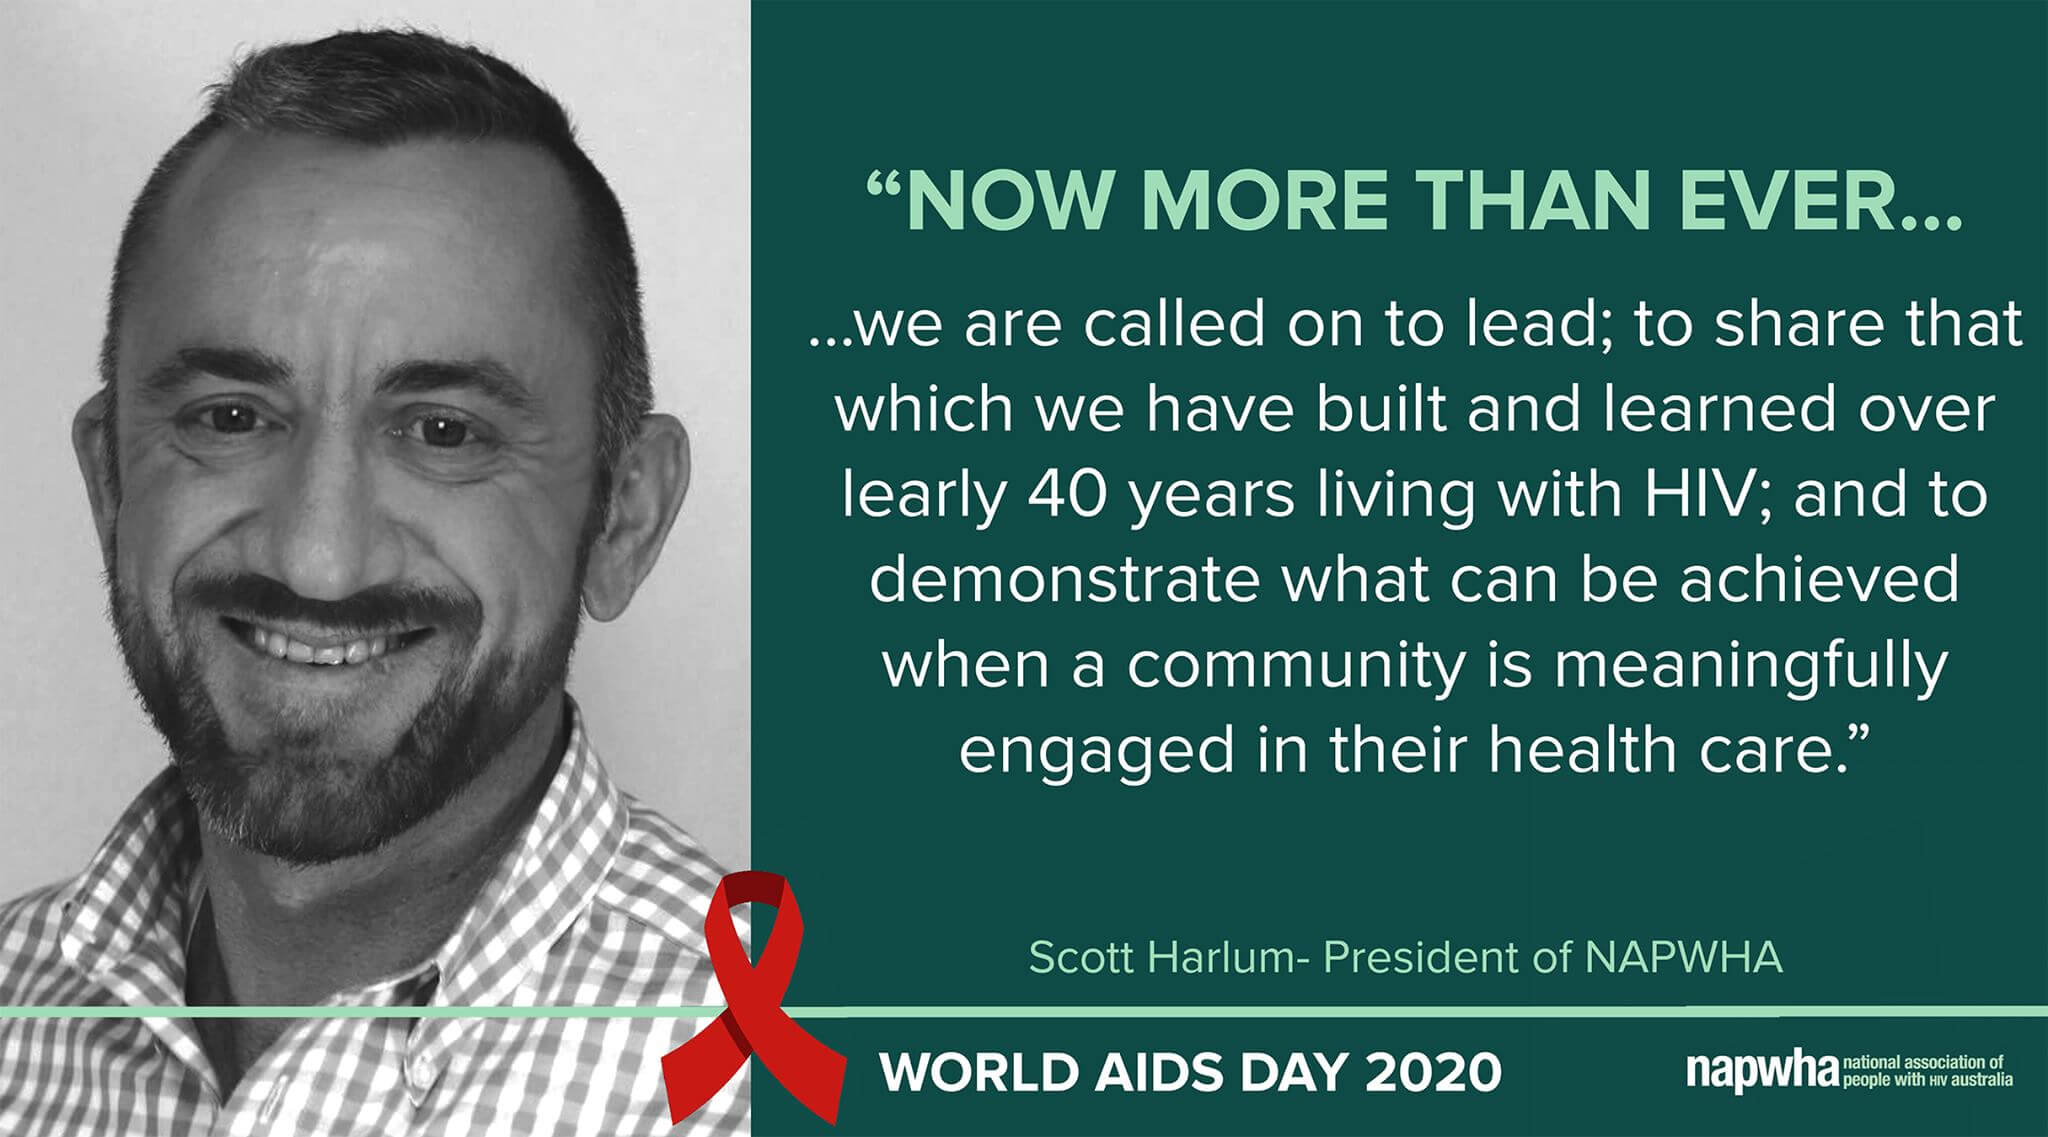 Scott Harlum, NAPWHA President provides a World AIDS Day 2020 message